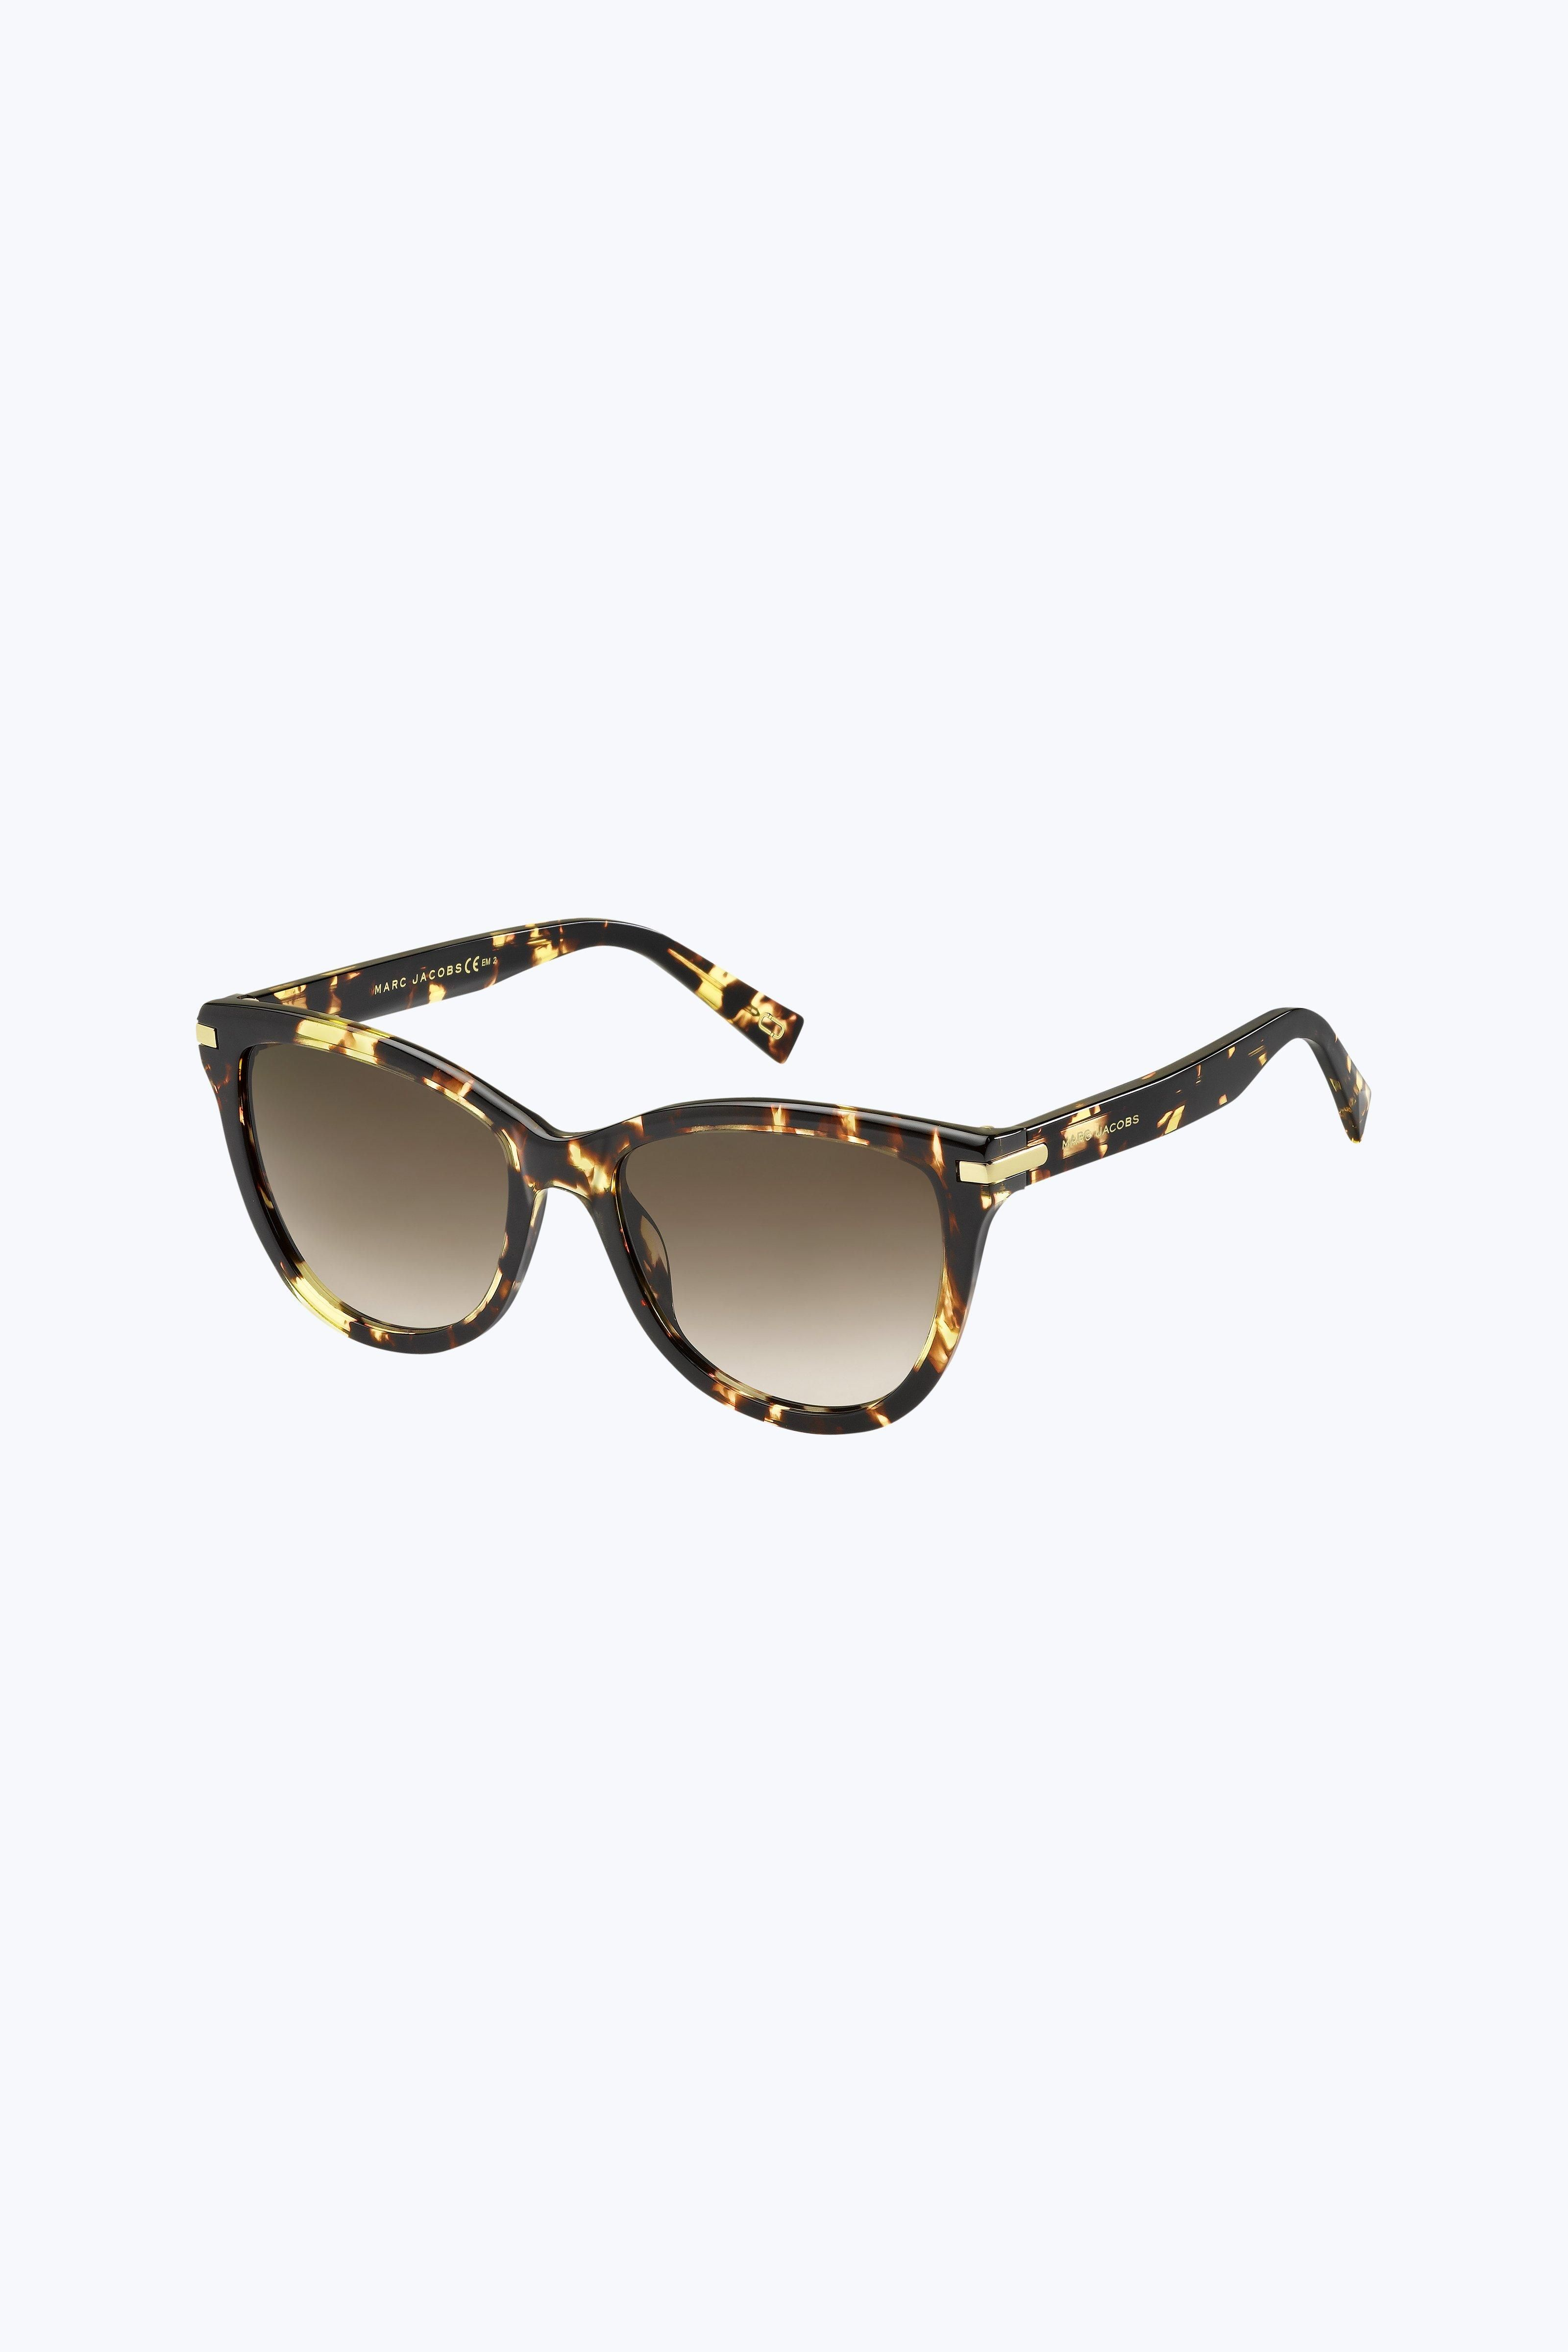 566c551e47 MARC JACOBS Spotted Havana Sunglasses.  marcjacobs